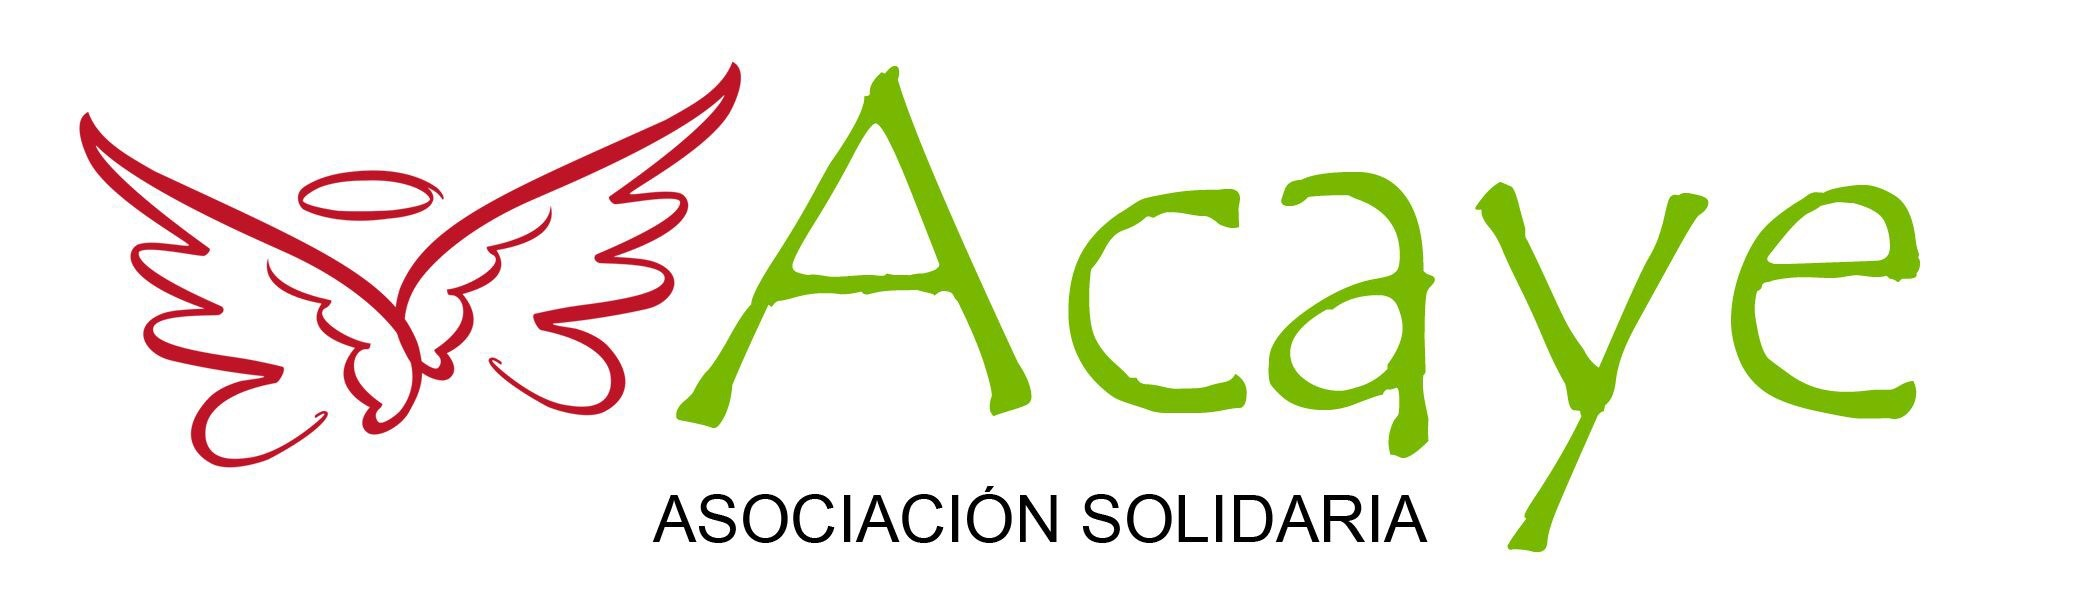 Acaye - Asociación solidaria de Dos Hermanas